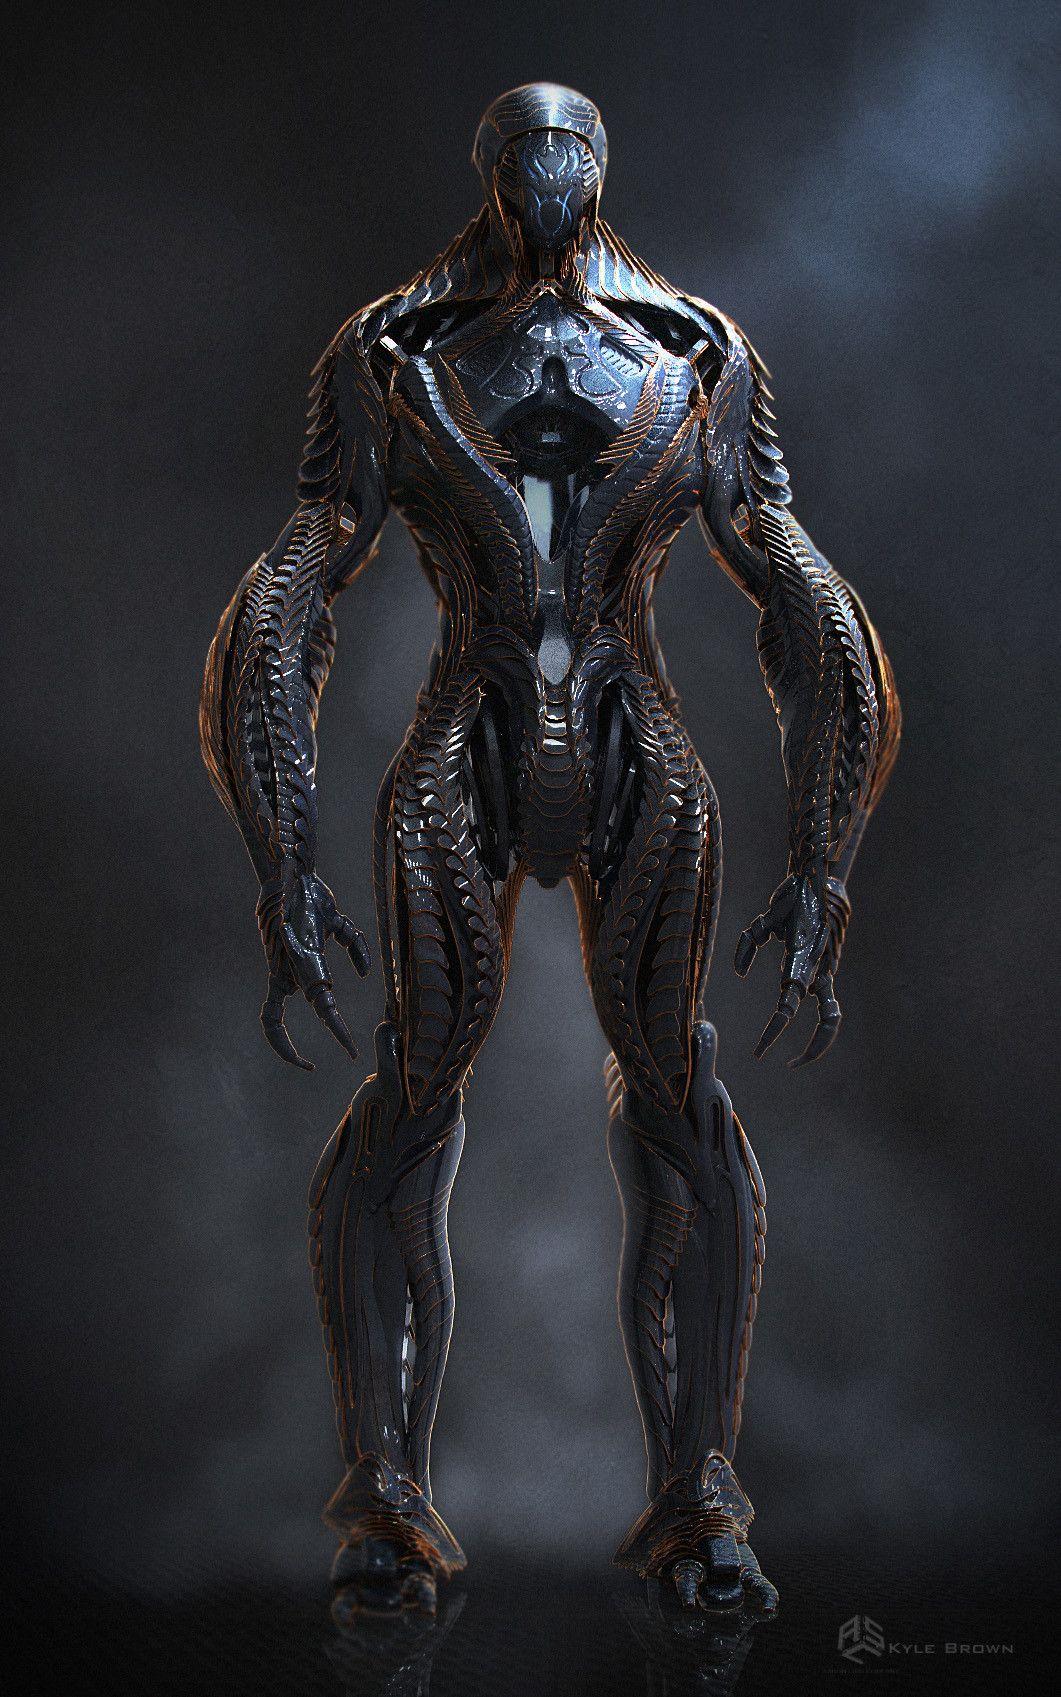 Artstation Lost In Space 2018 Netflix Robot Concepts Kyle Brown Lost In Space Robots Concept Space Artwork